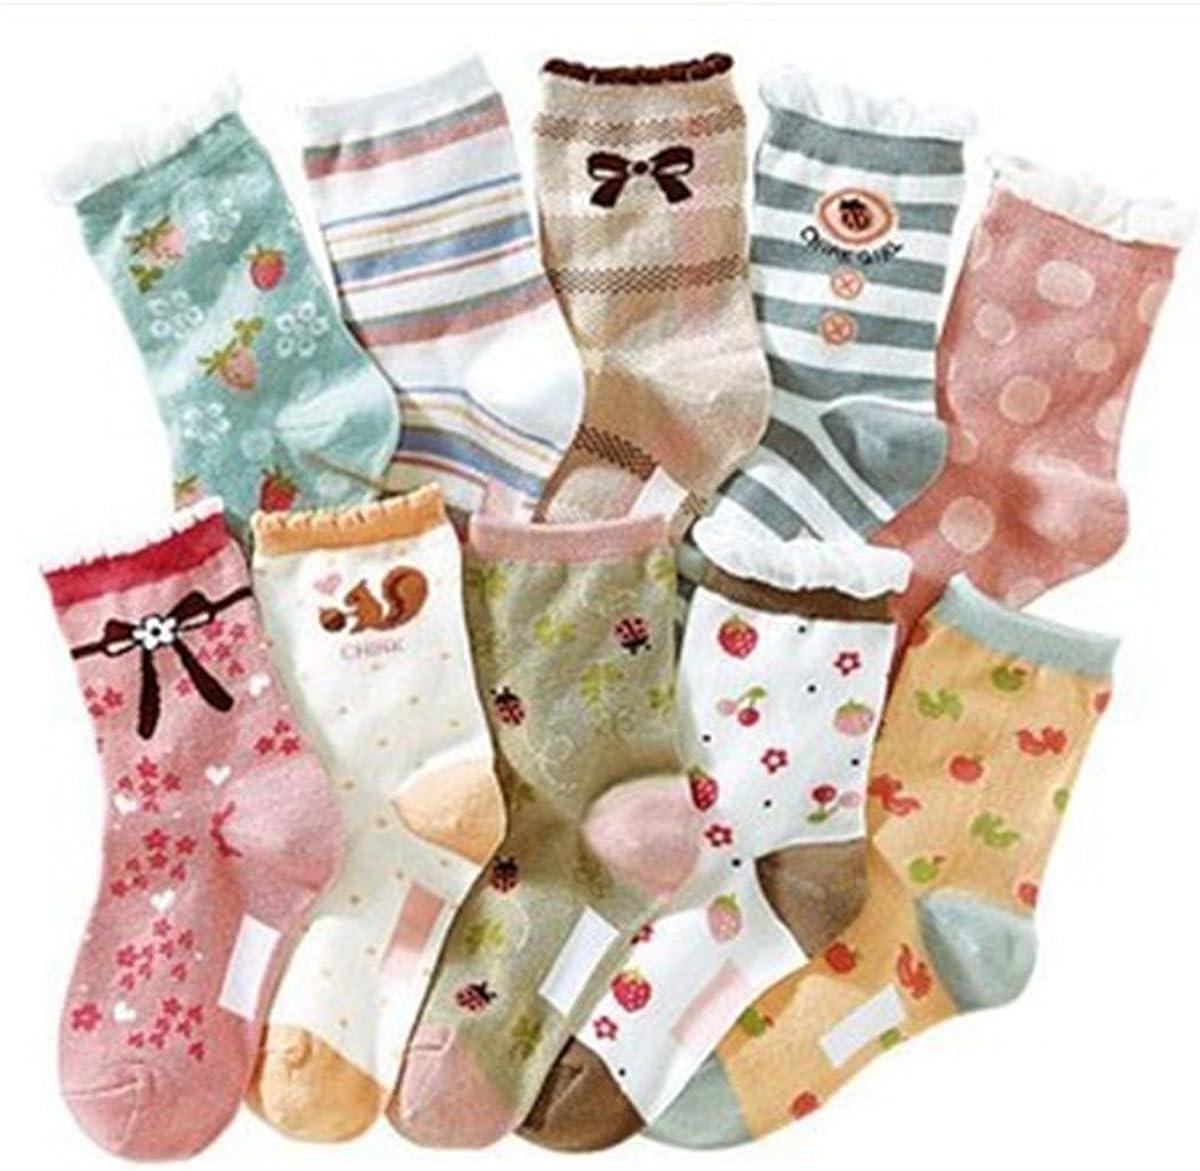 Girls Short Socks Fashion Strawberry Cotton Basic Crew Kids Socks 10 Pair Pack